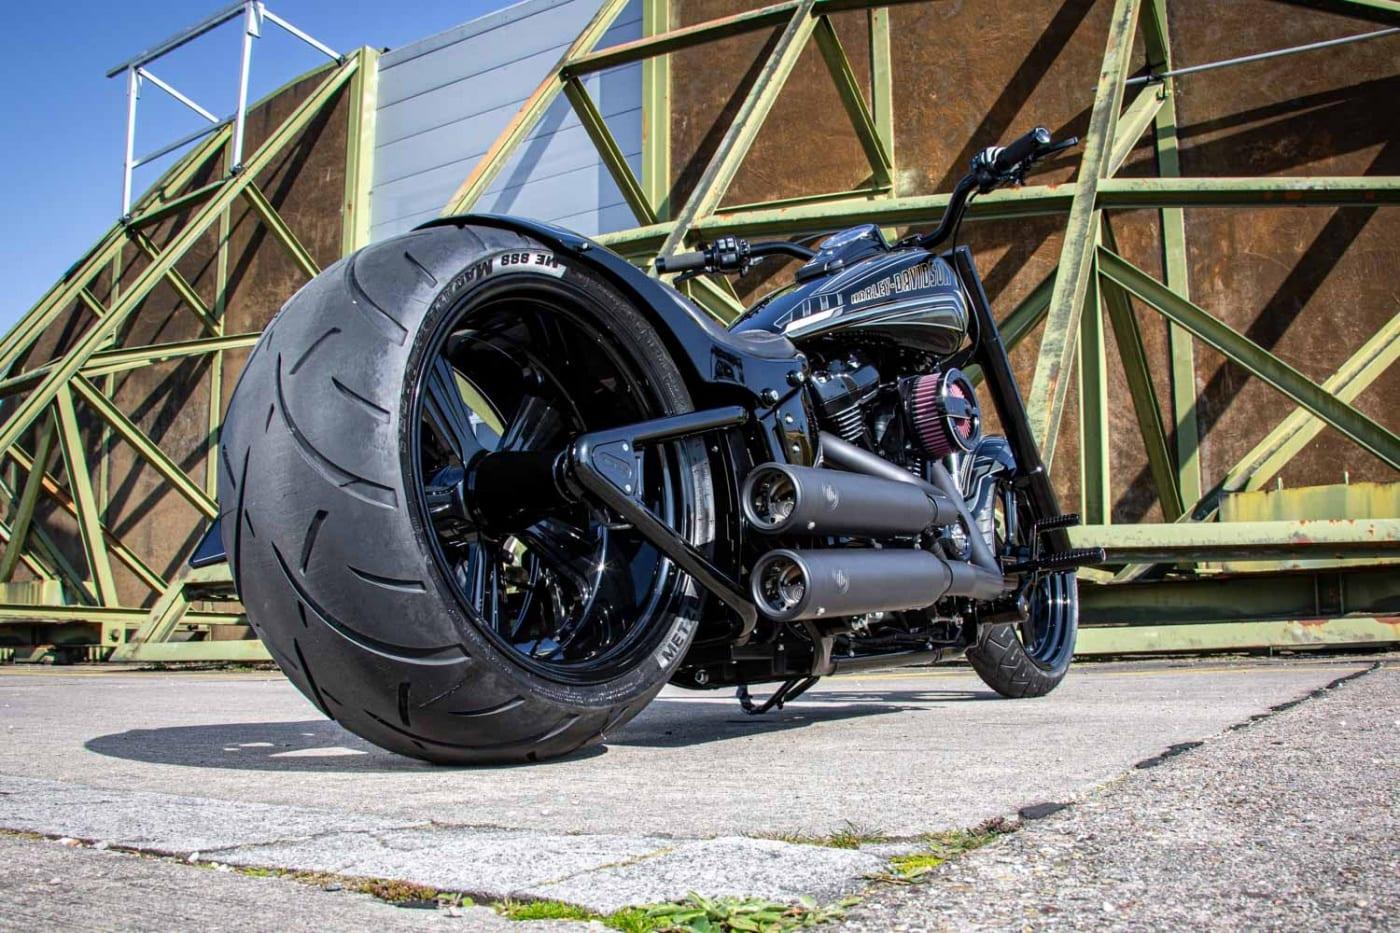 300er Schwingenkit von Rick´s Motorcycles